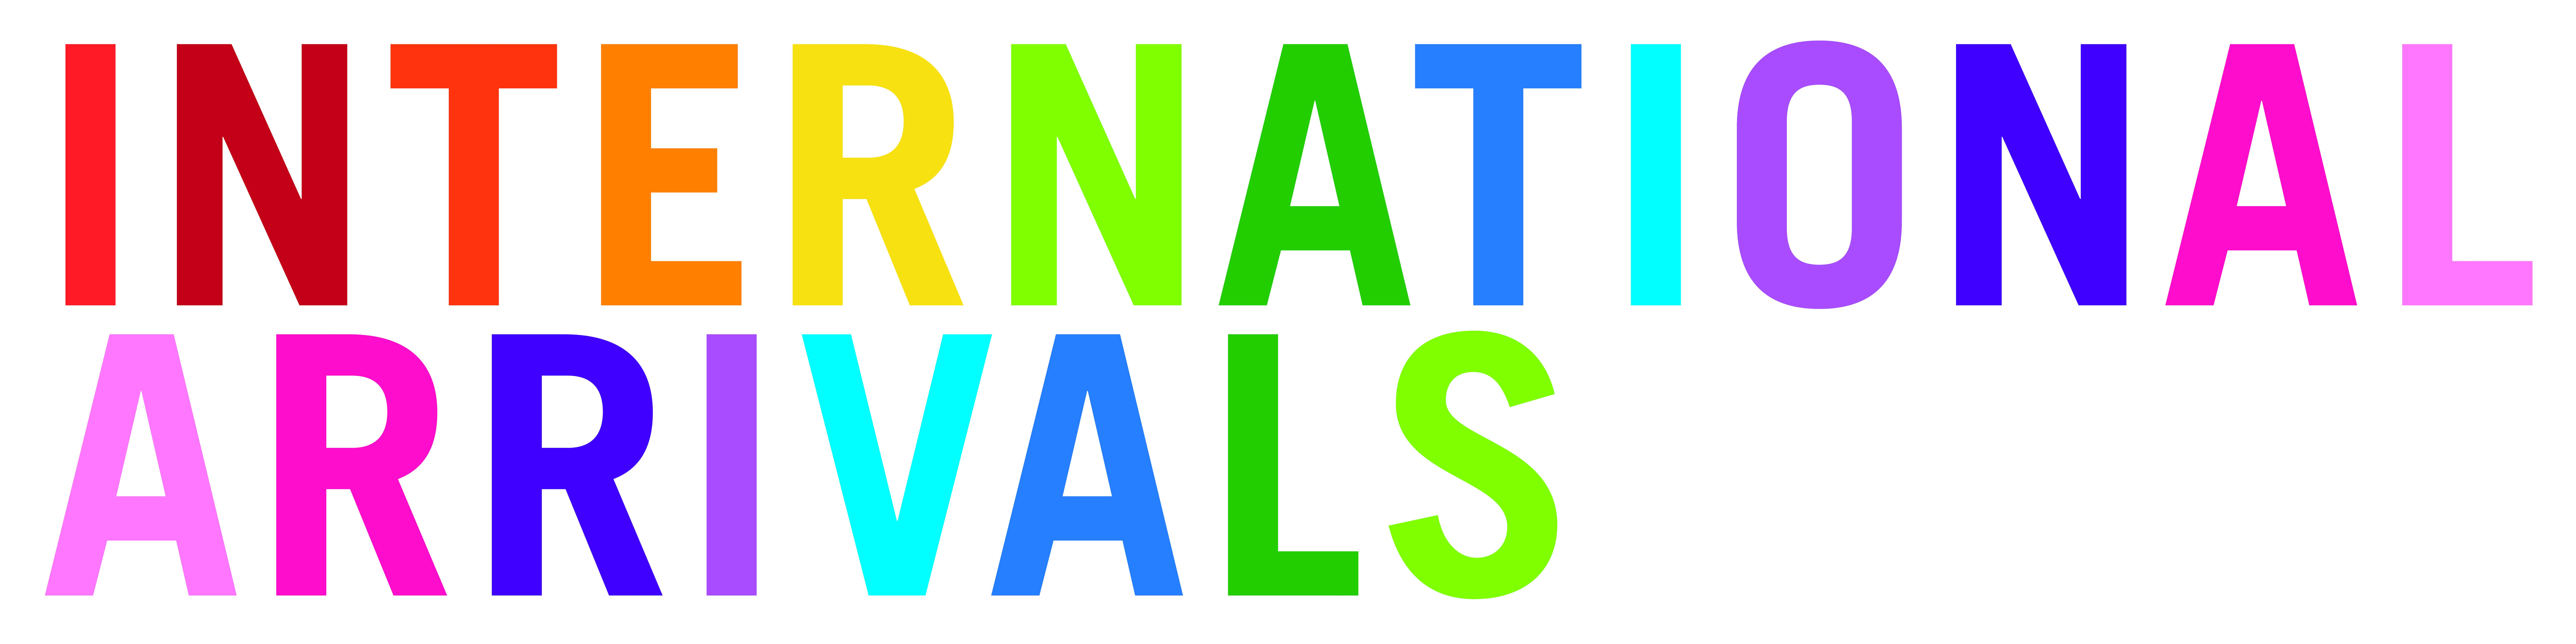 Intlarrivals_Logo_5x1.25